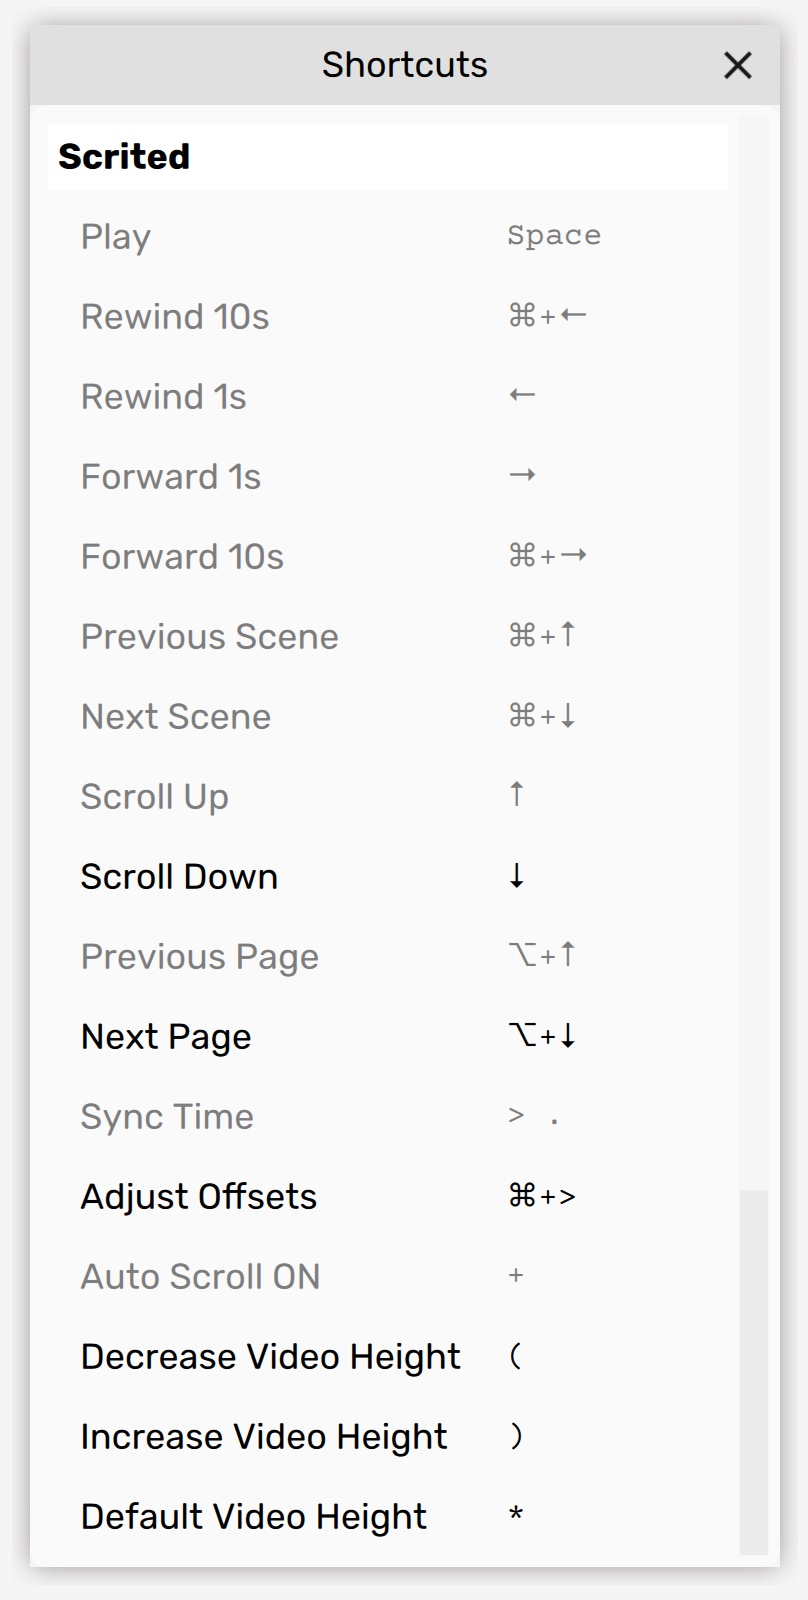 scrited-tab-shortcuts.jpg